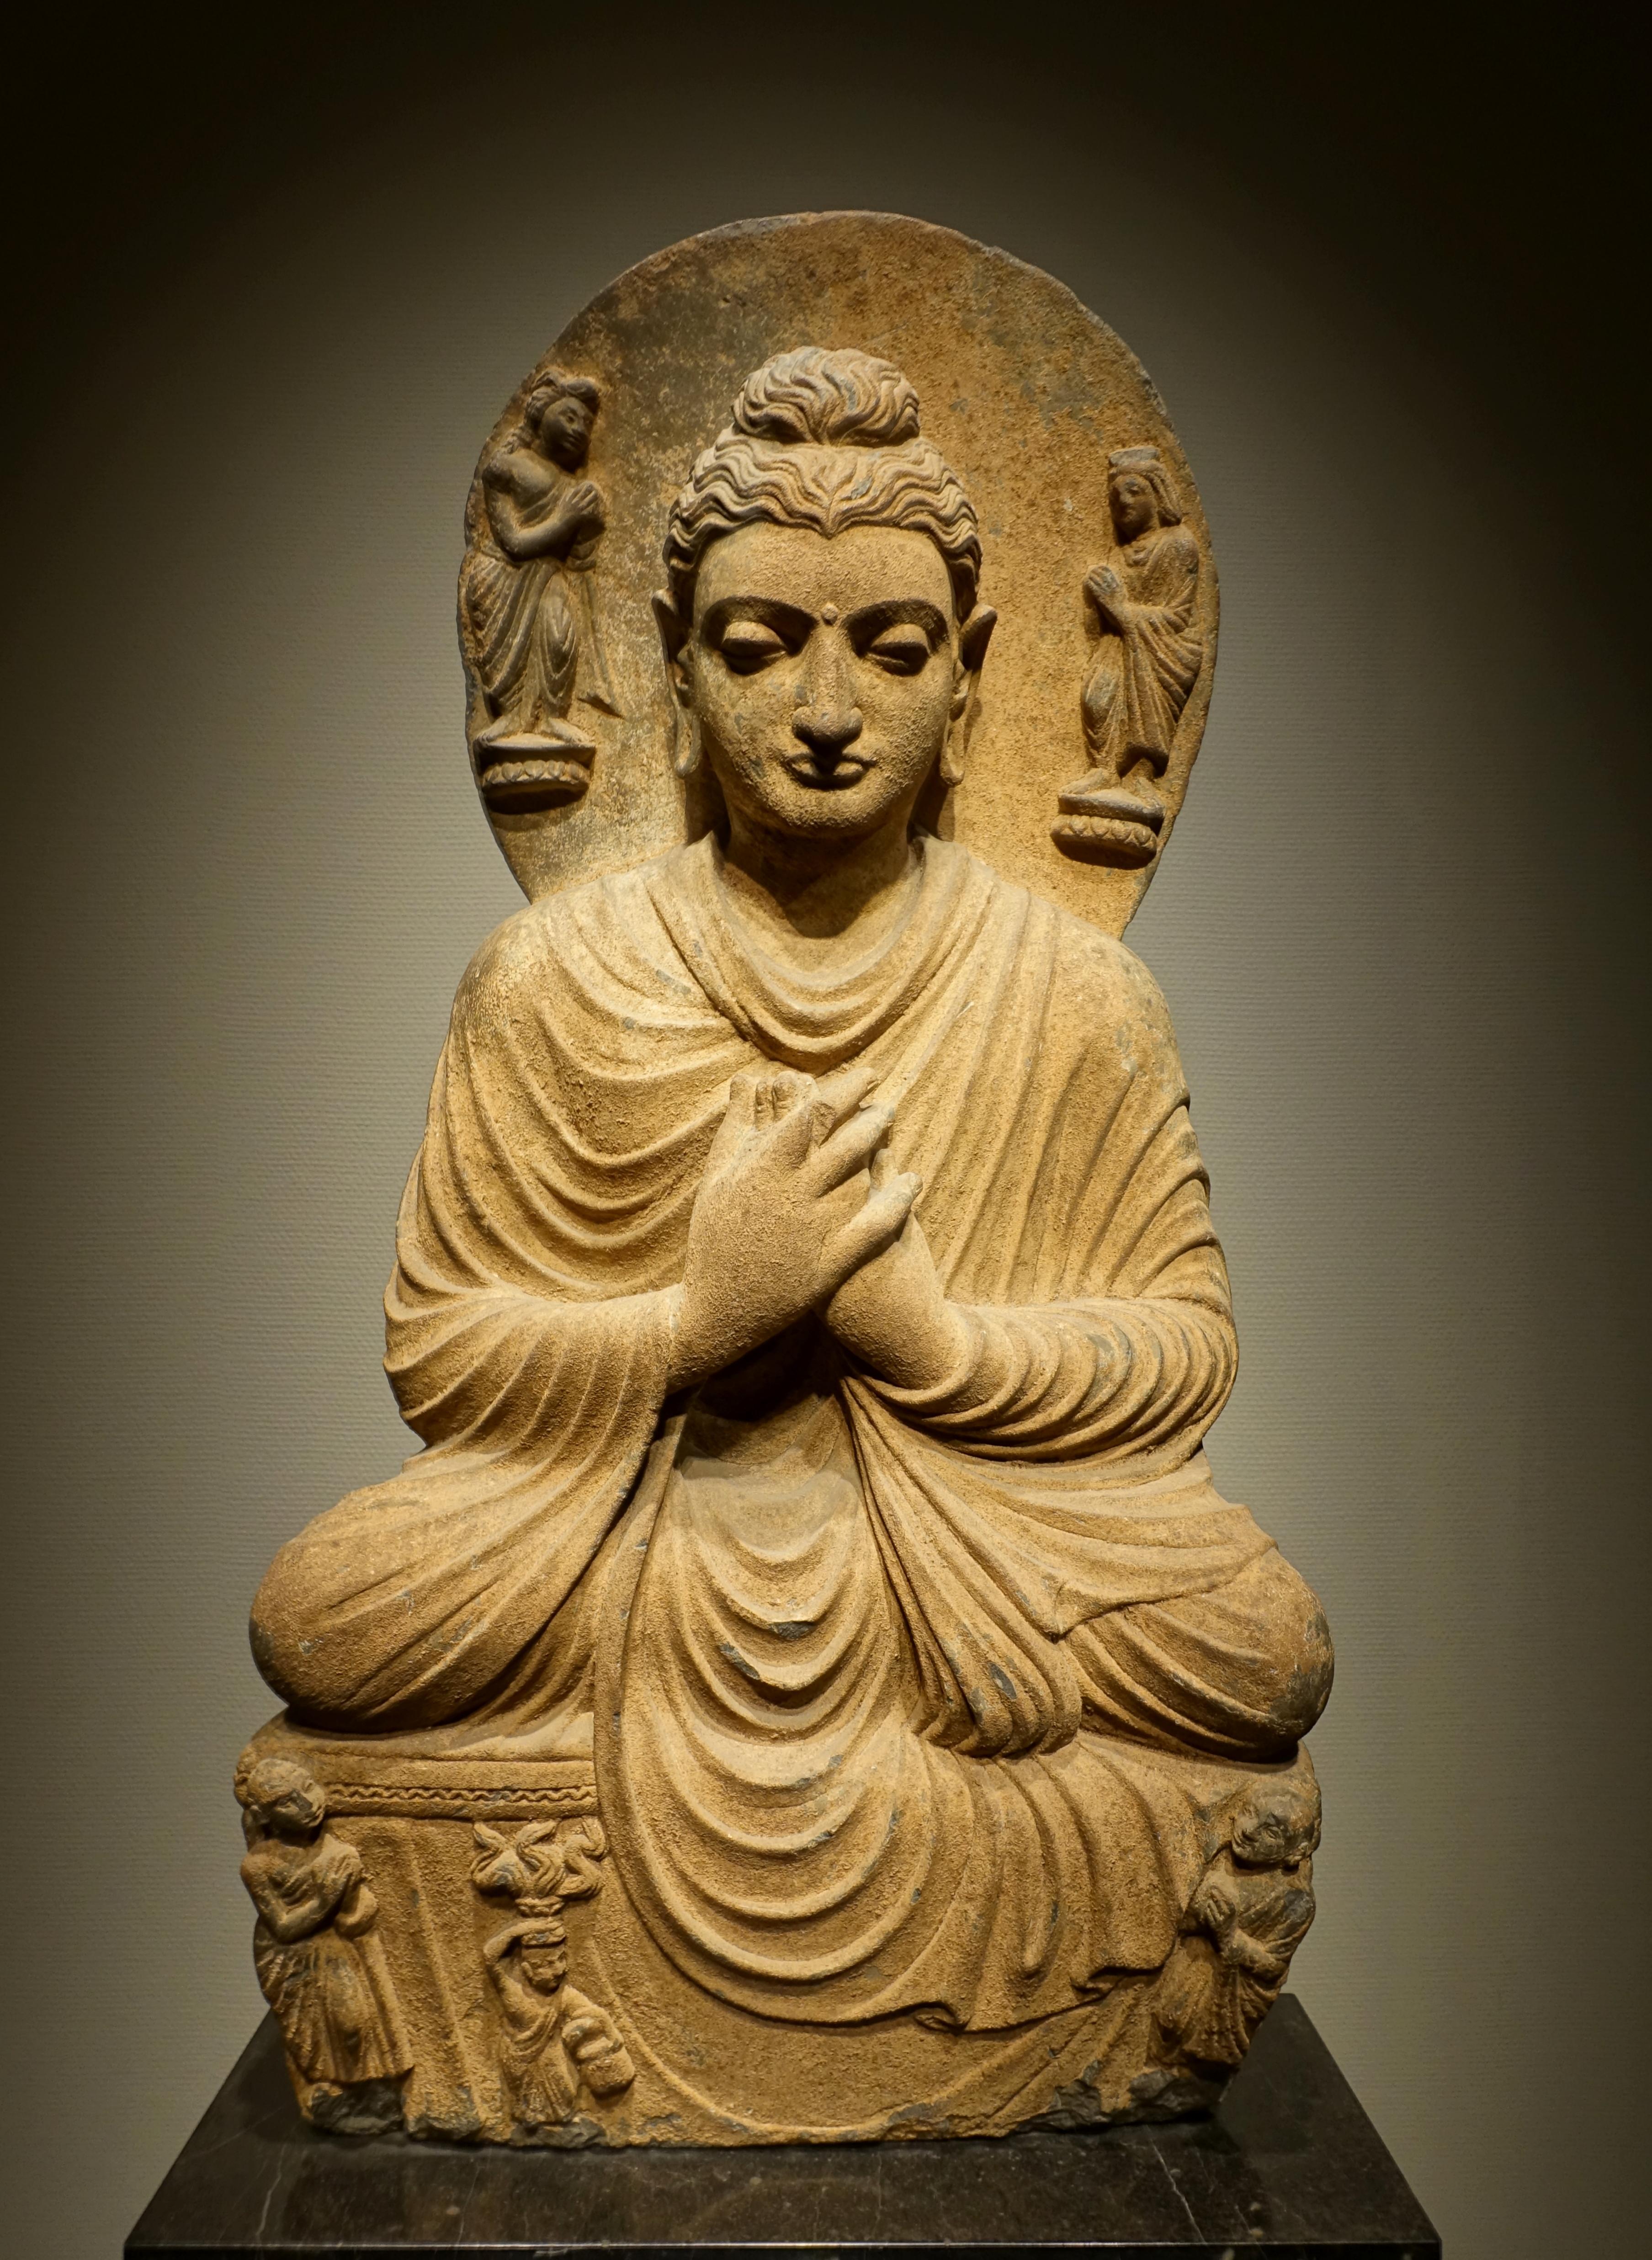 File Seated Buddha Gandhara Pakistan Kushan Dynasty 100s 200s Ad Schist Tokyo National Museum Tokyo Japan Dsc08664 Jpg Wikimedia Commons